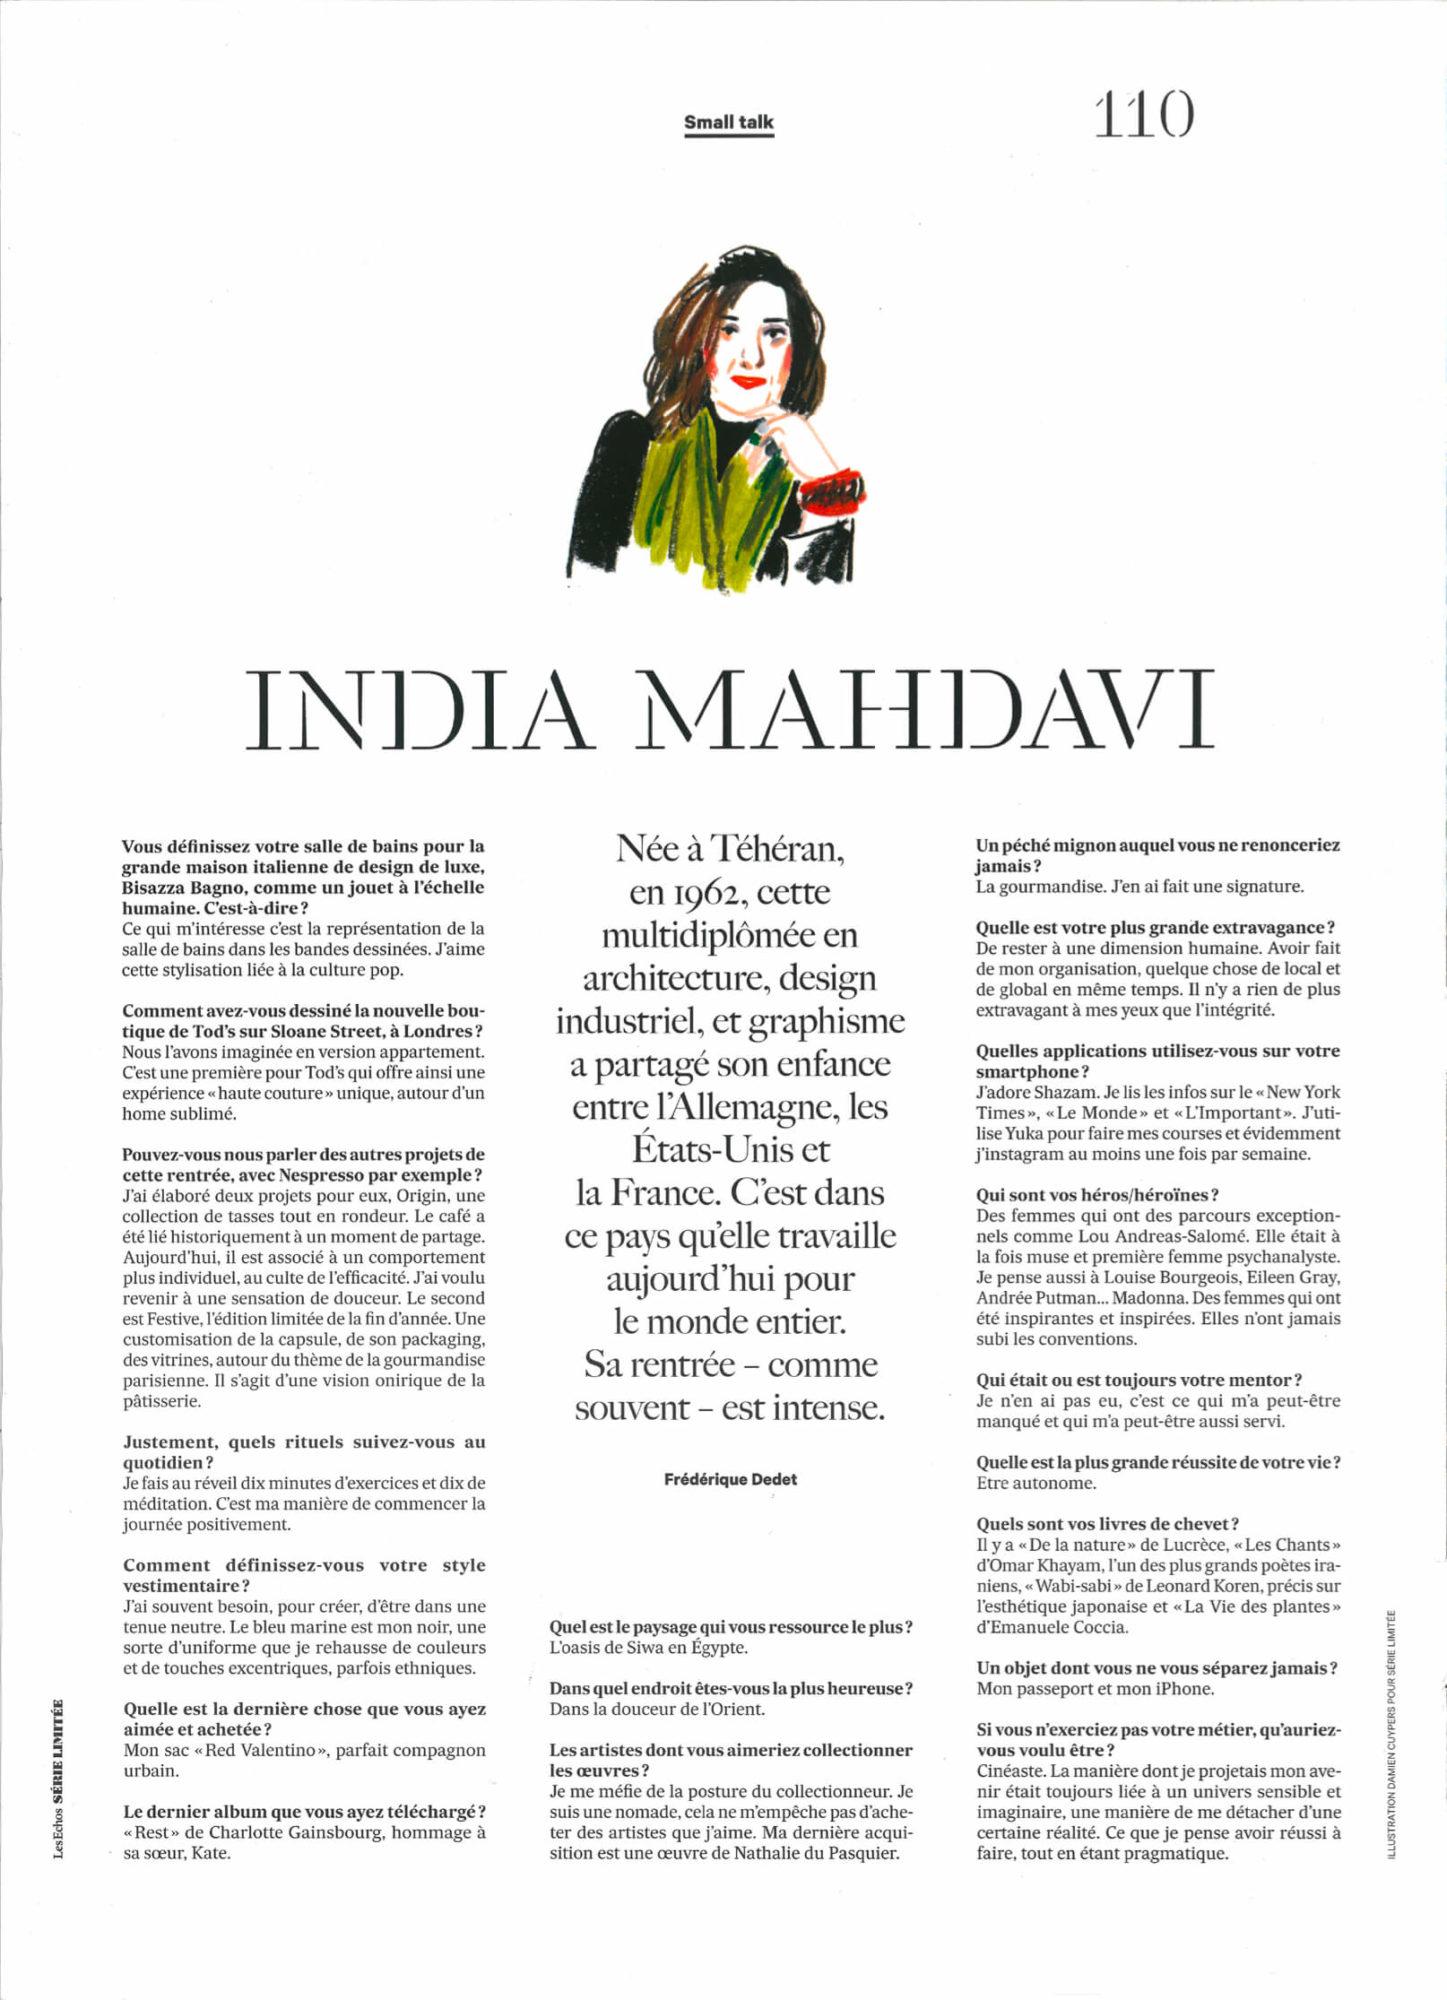 small talk - India Mahdavi